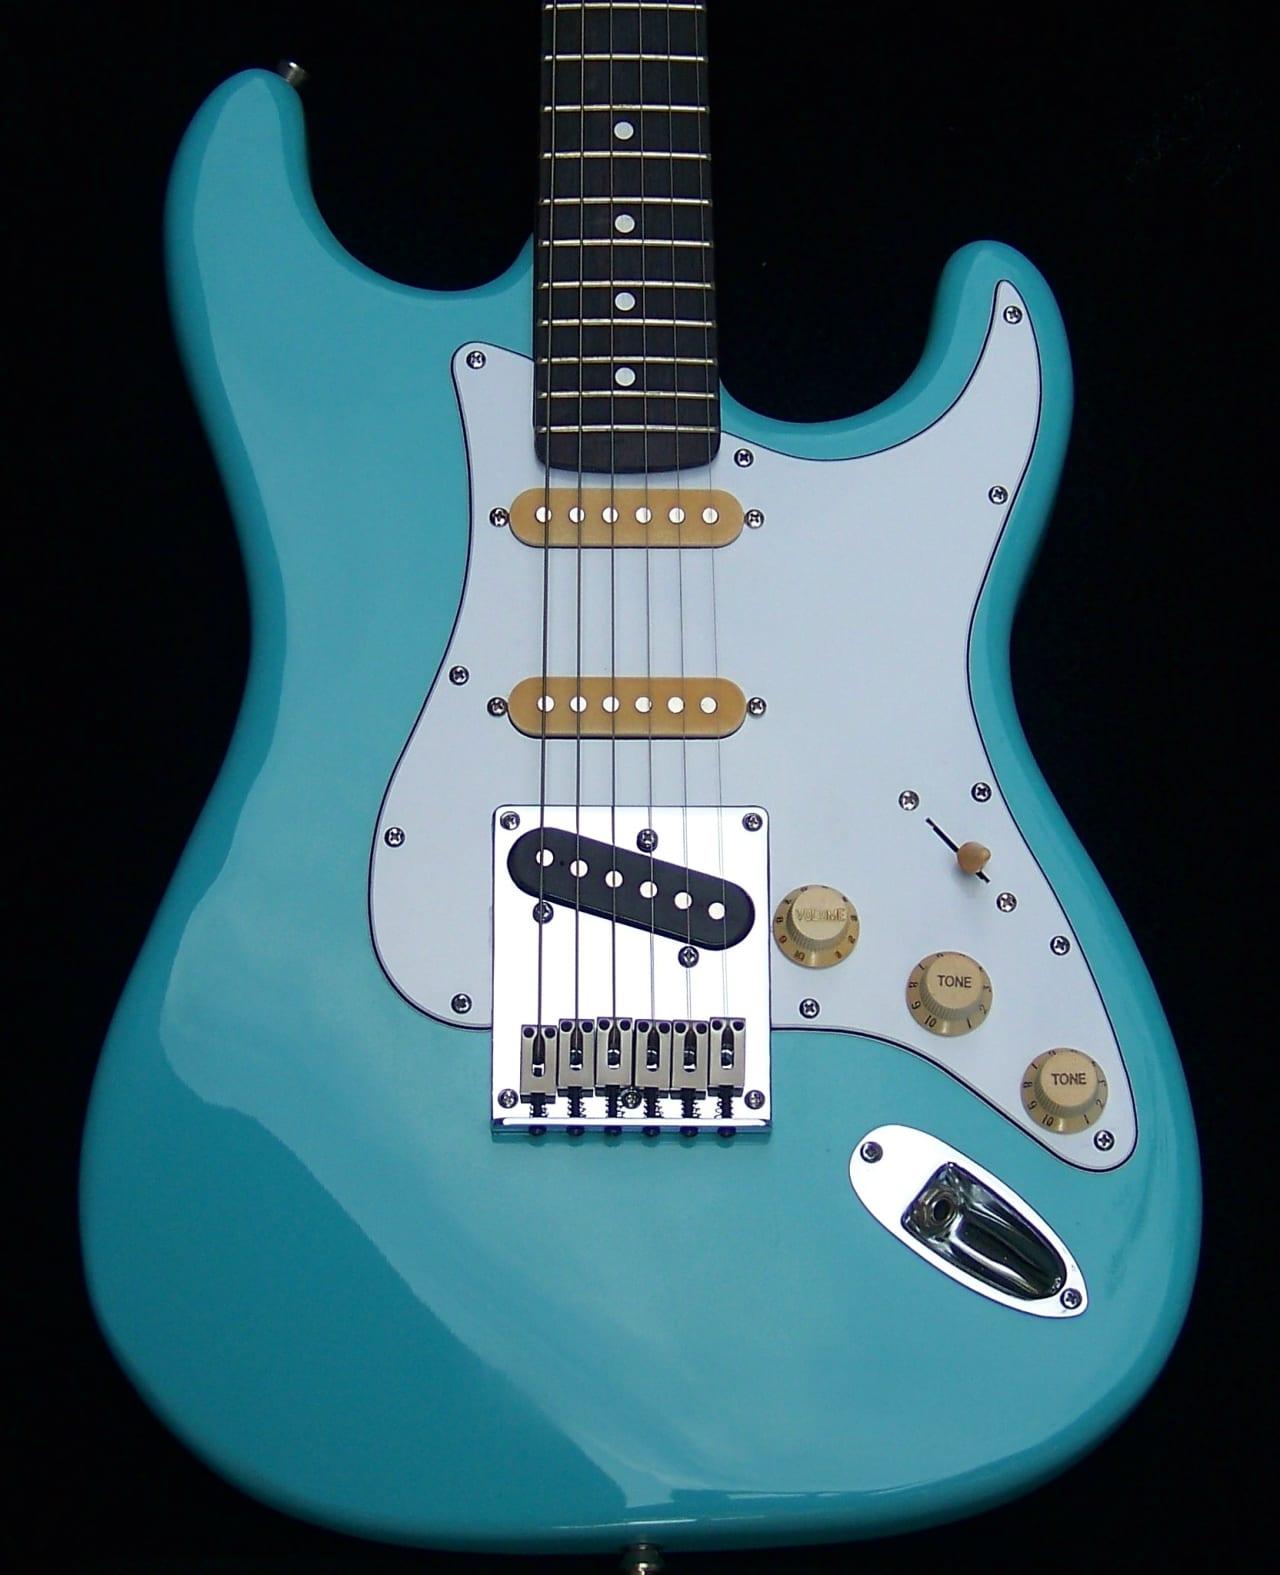 Haywire Modified/Fender Daphne Blue Strat+Tele+Warmoth | Reverb